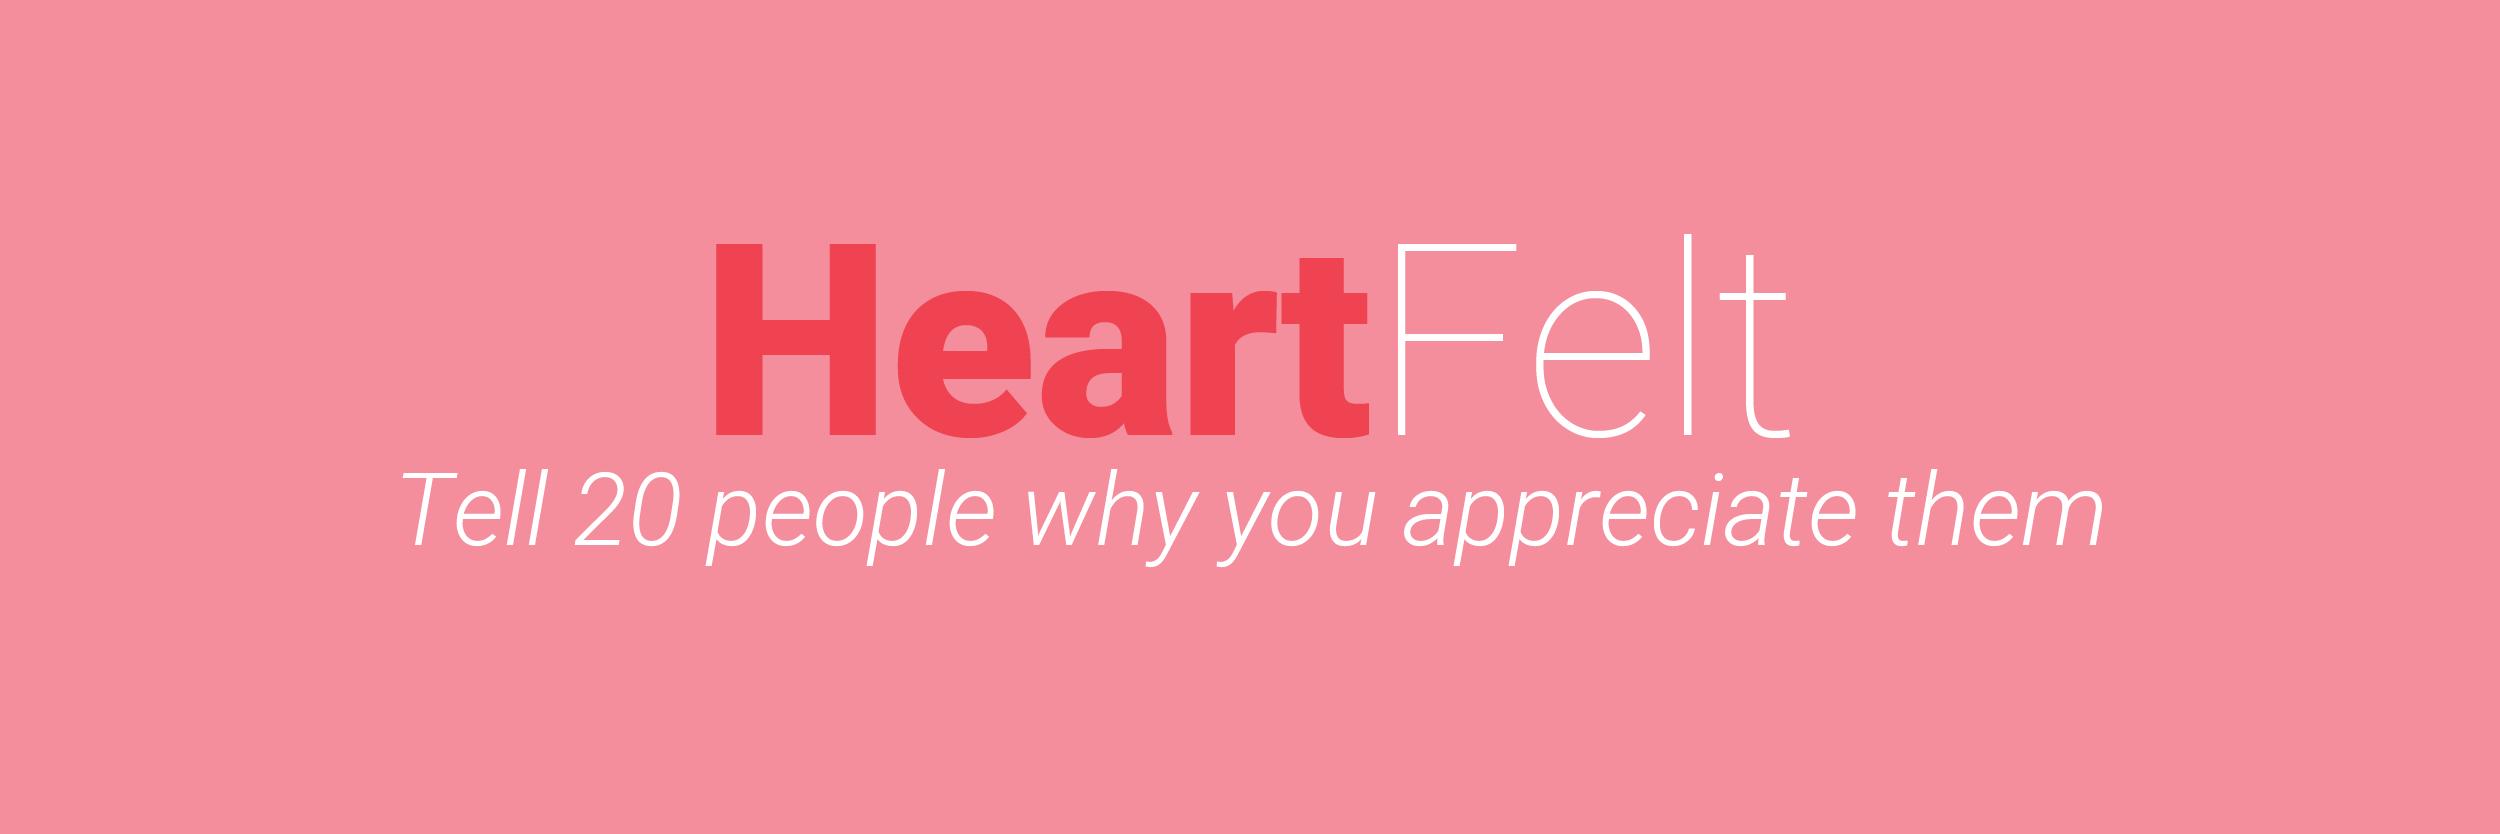 Heart Felt-01